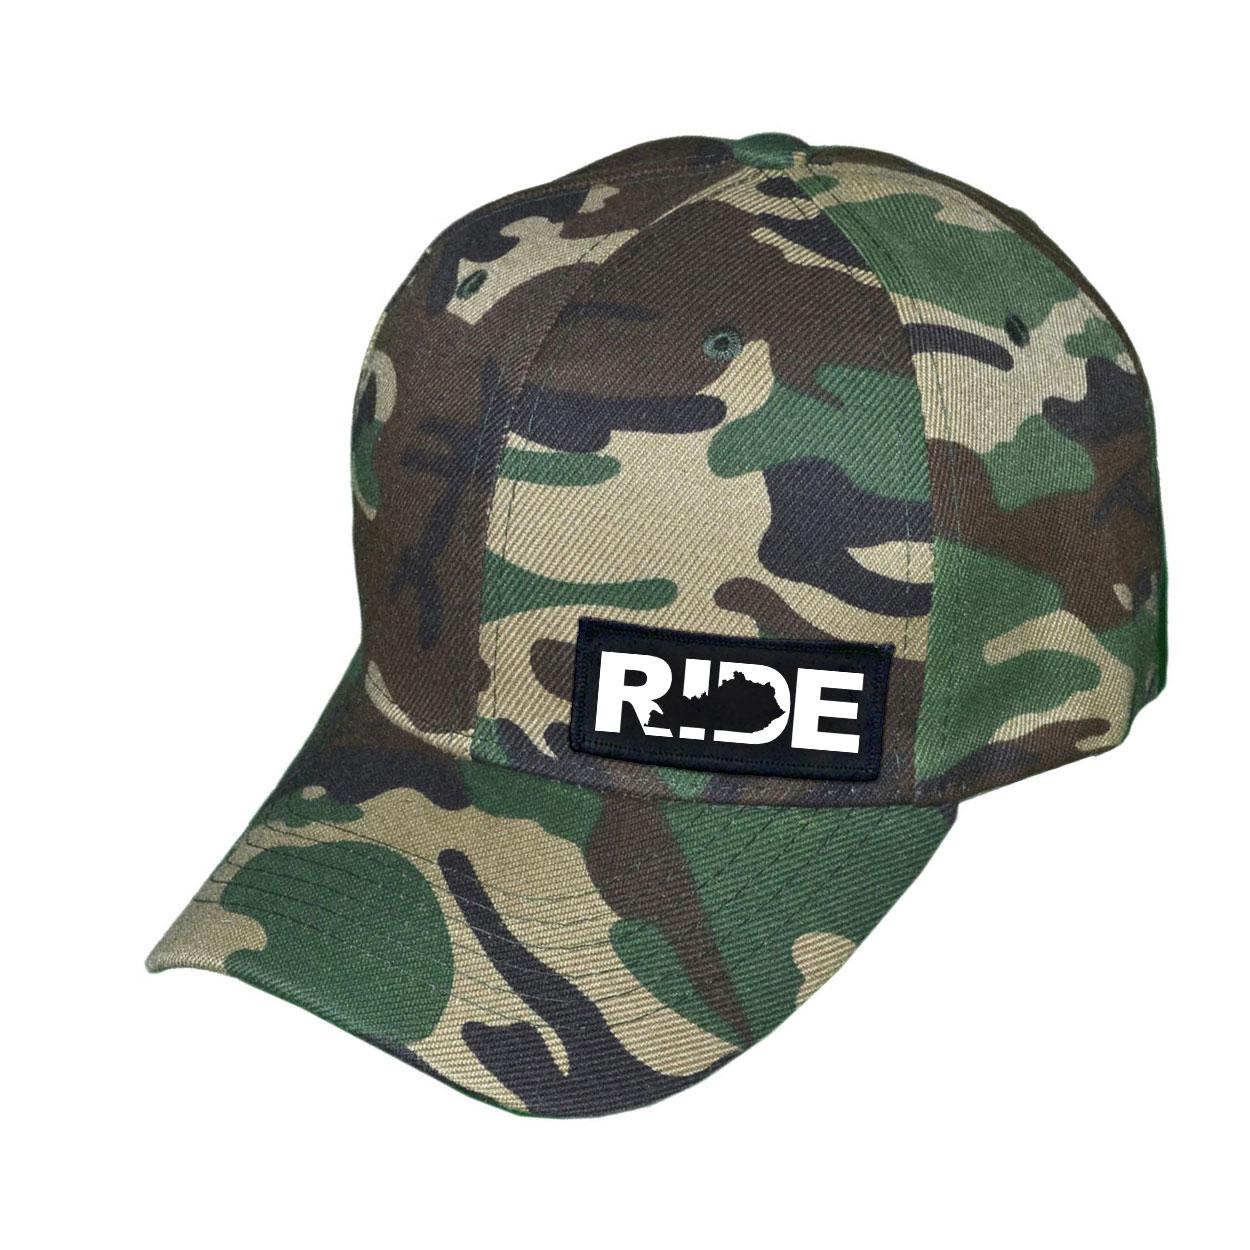 Ride Kentucky Night Out Woven Patch Hat Camo (White Logo)